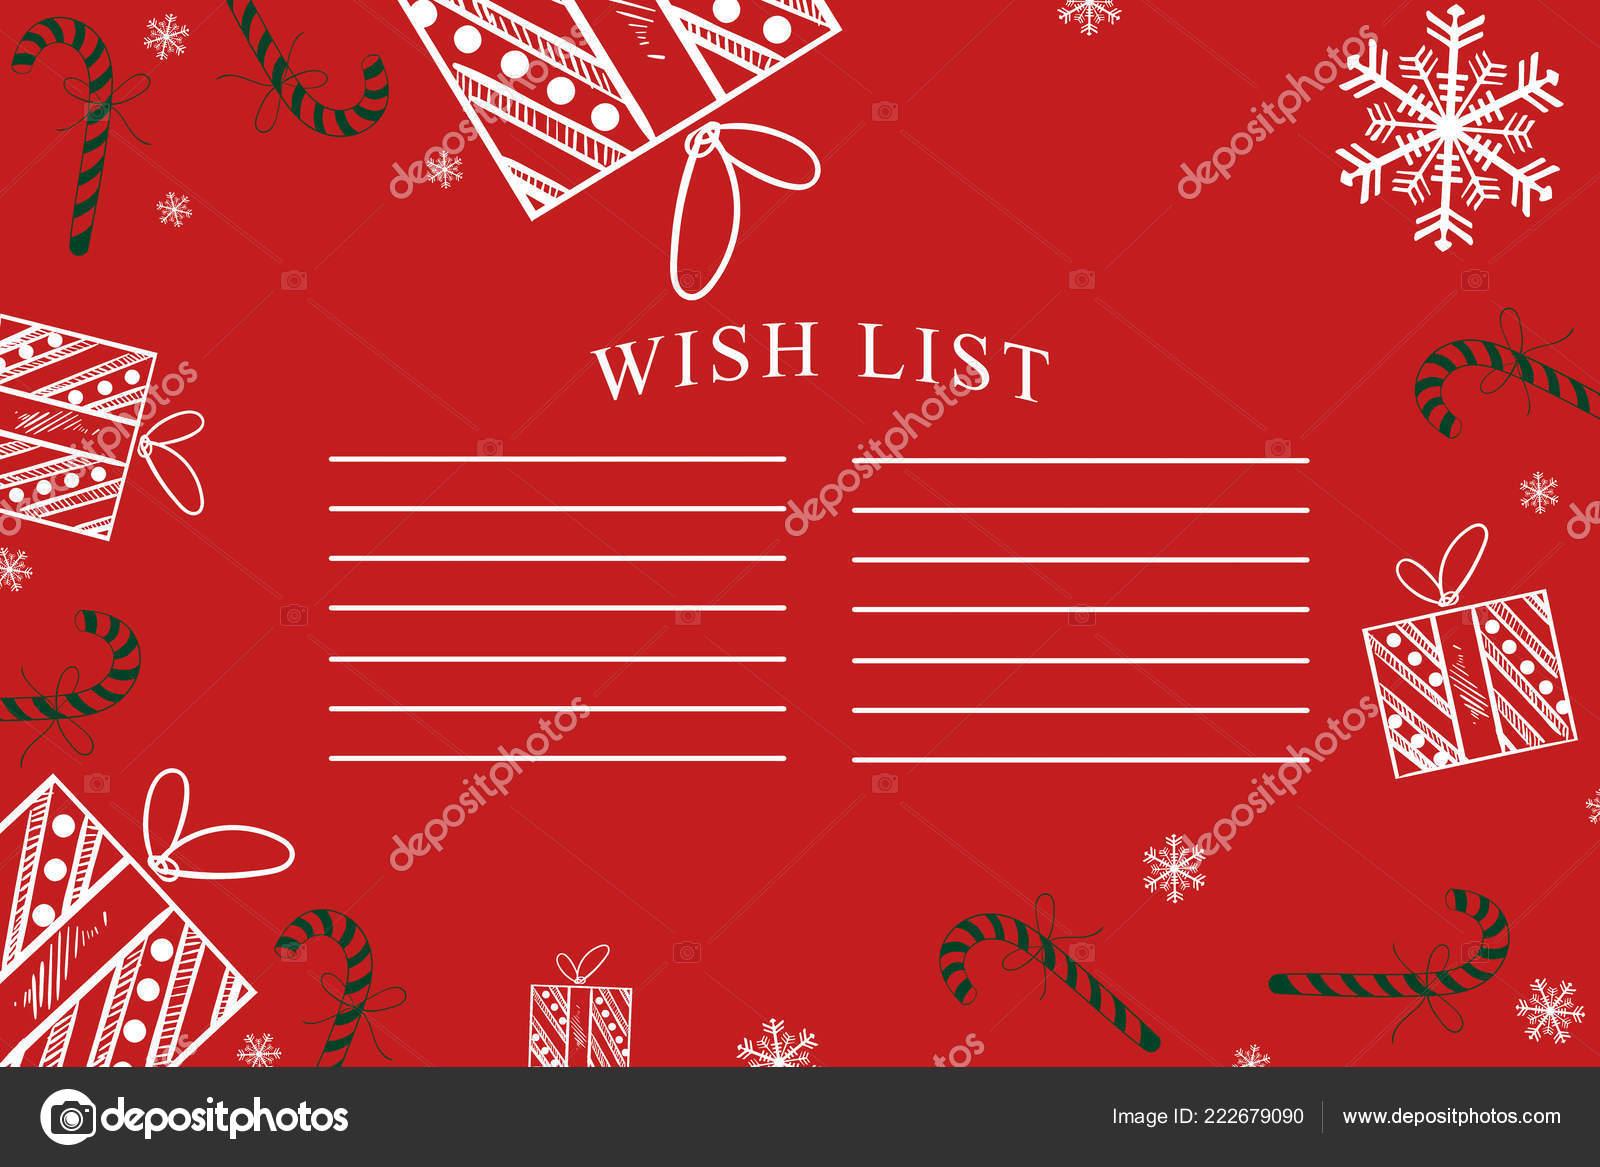 Christmas Wish List Christmas Background Gifts Christmas Decorations